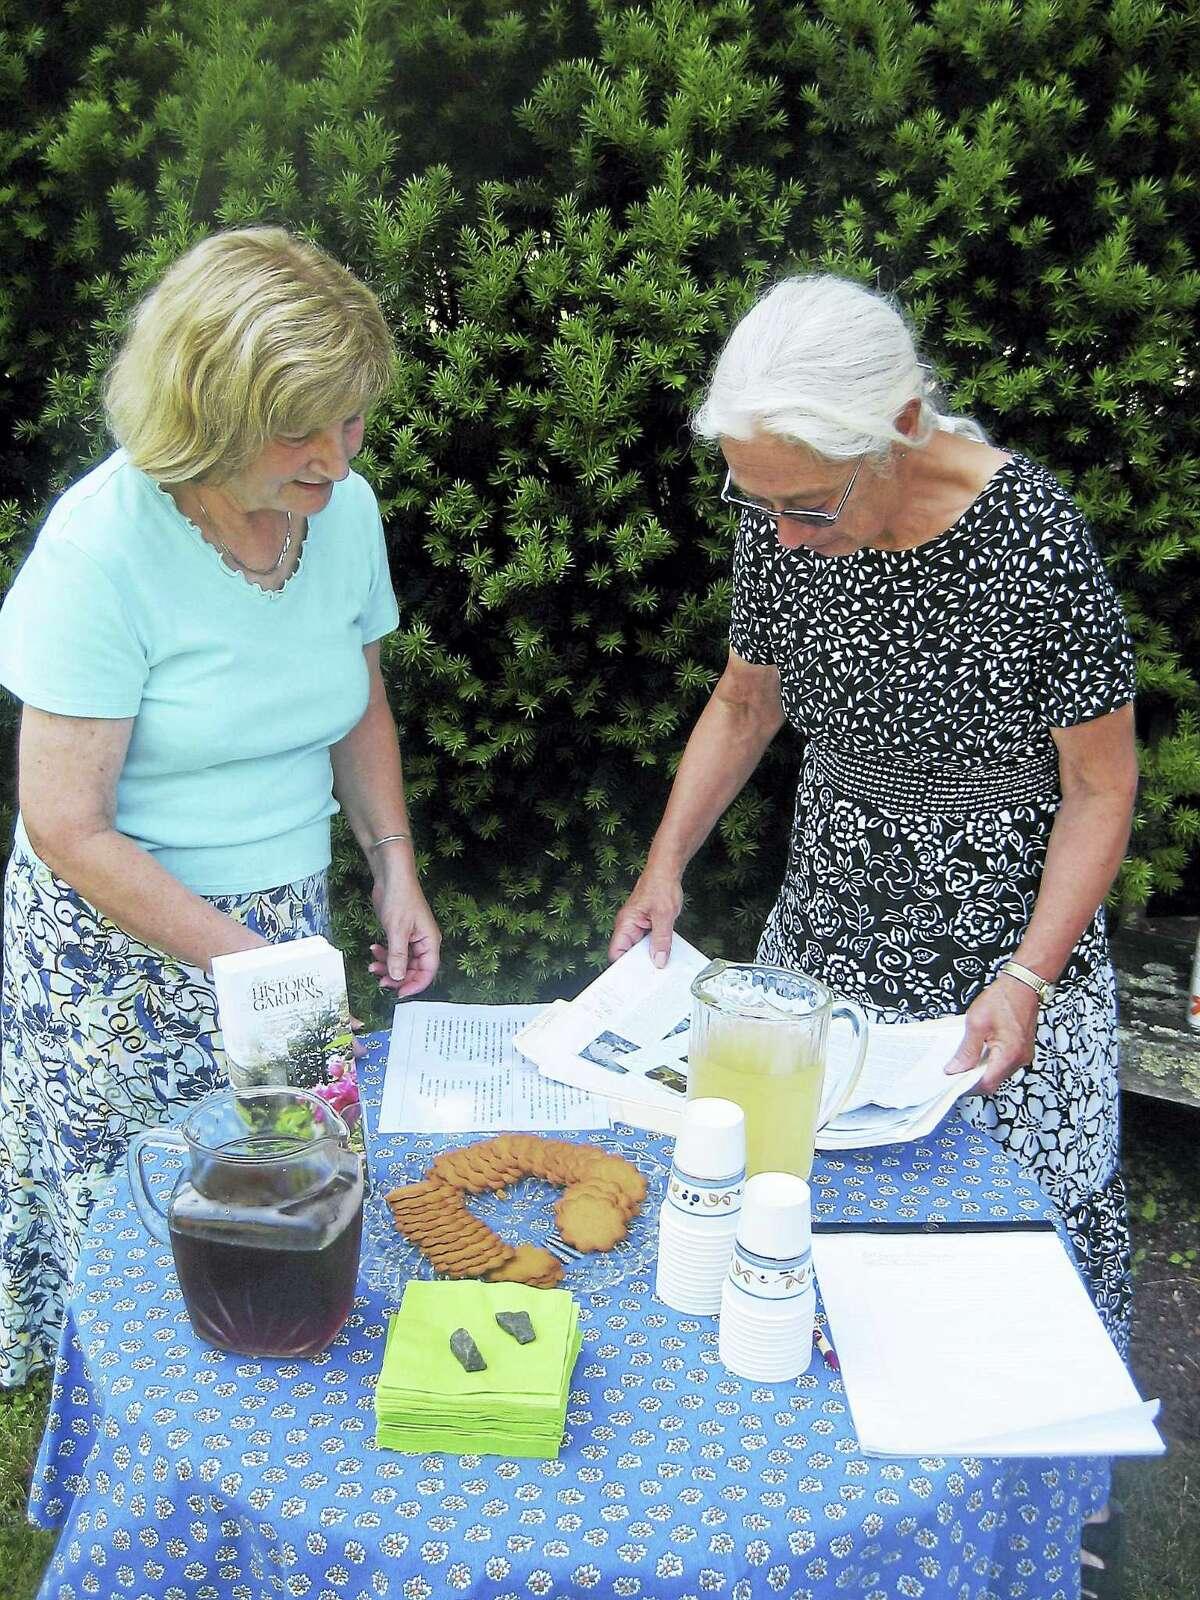 John Torsiello photo Volunteers Debbie Soresino and Priscilla Price get snacks and drinks ready.